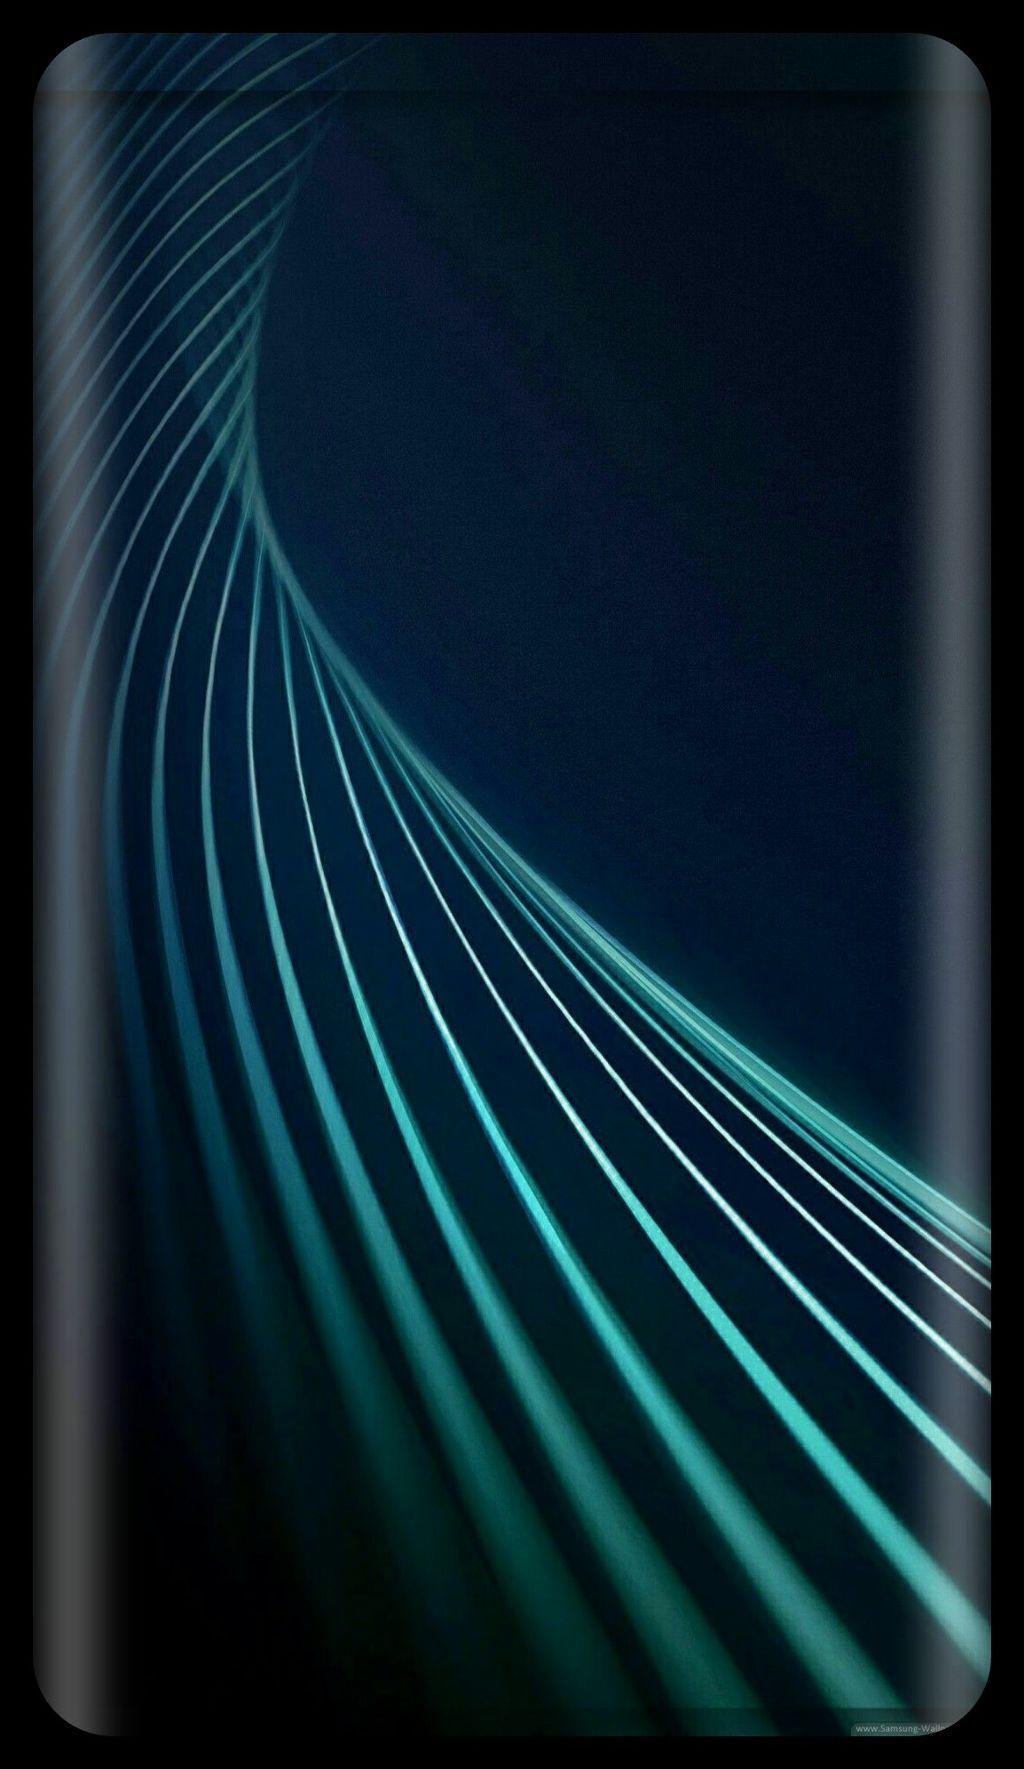 Elanglaut1981 Profiles In 2020 Galaxy Wallpaper Samsung Wallpaper Abstract Artwork